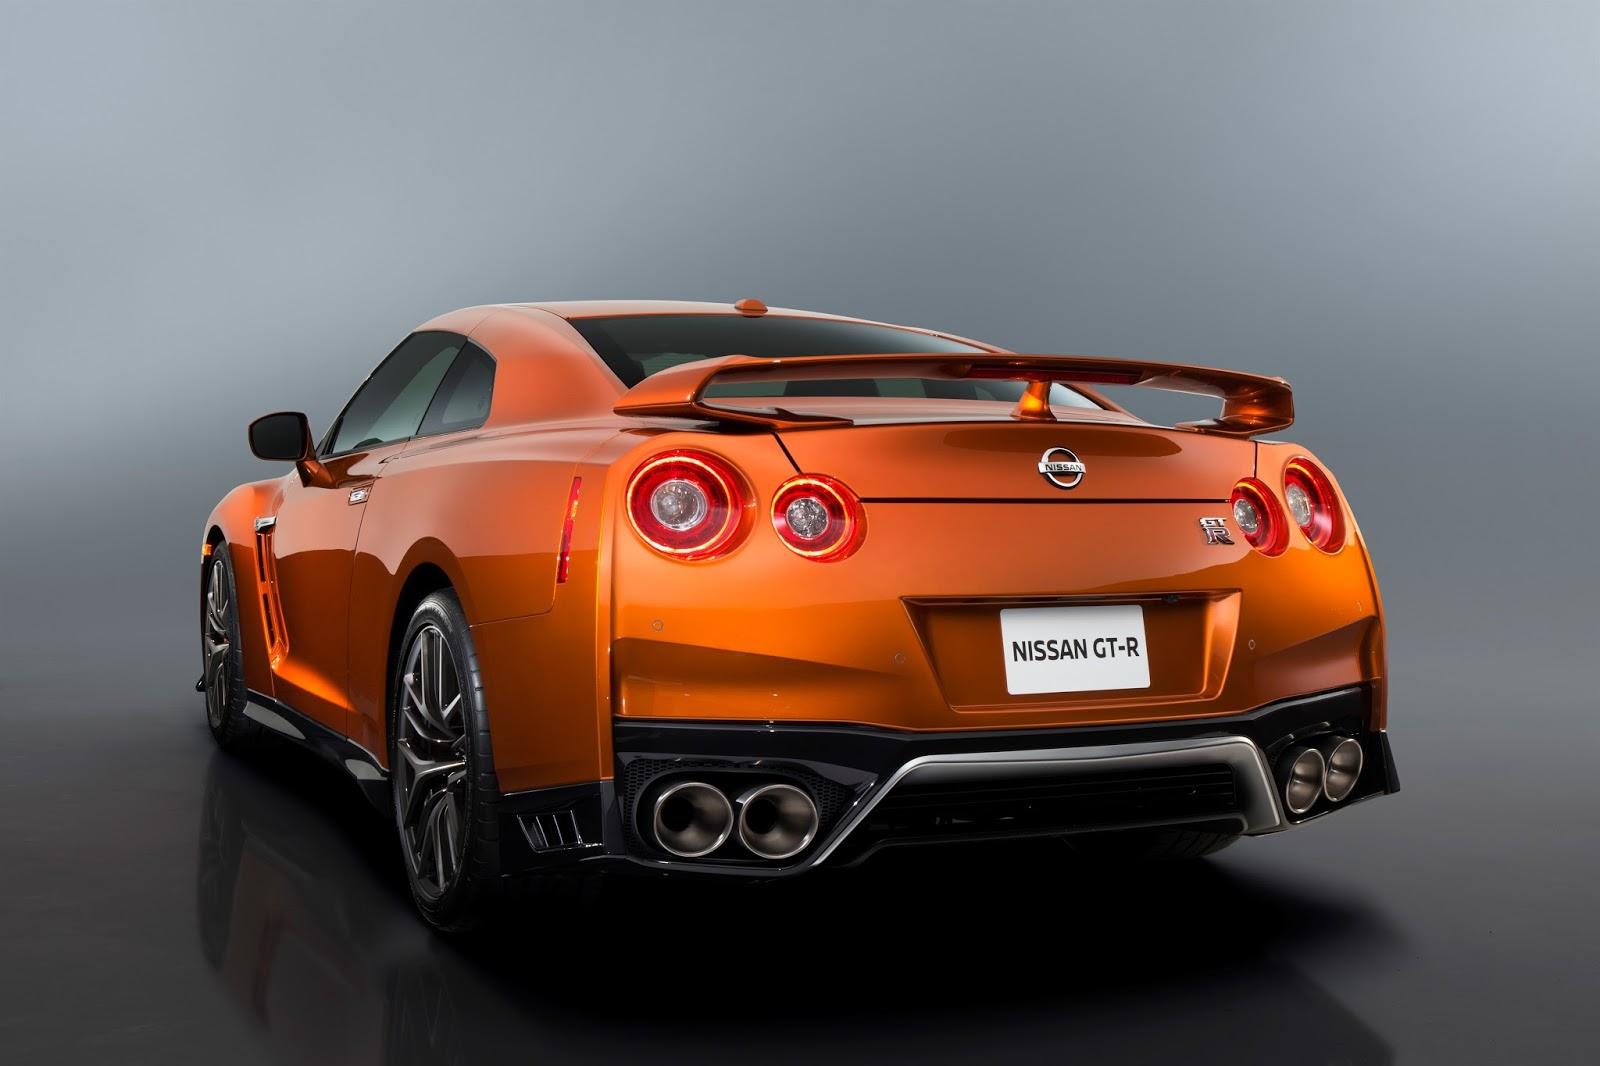 144067 1 5 Nissan GT-R: Ο Godzilla επέστρεψε! Godzilla, Nissan, Nissan GT-R, supercars, έκθεση Νέας Υόρκης